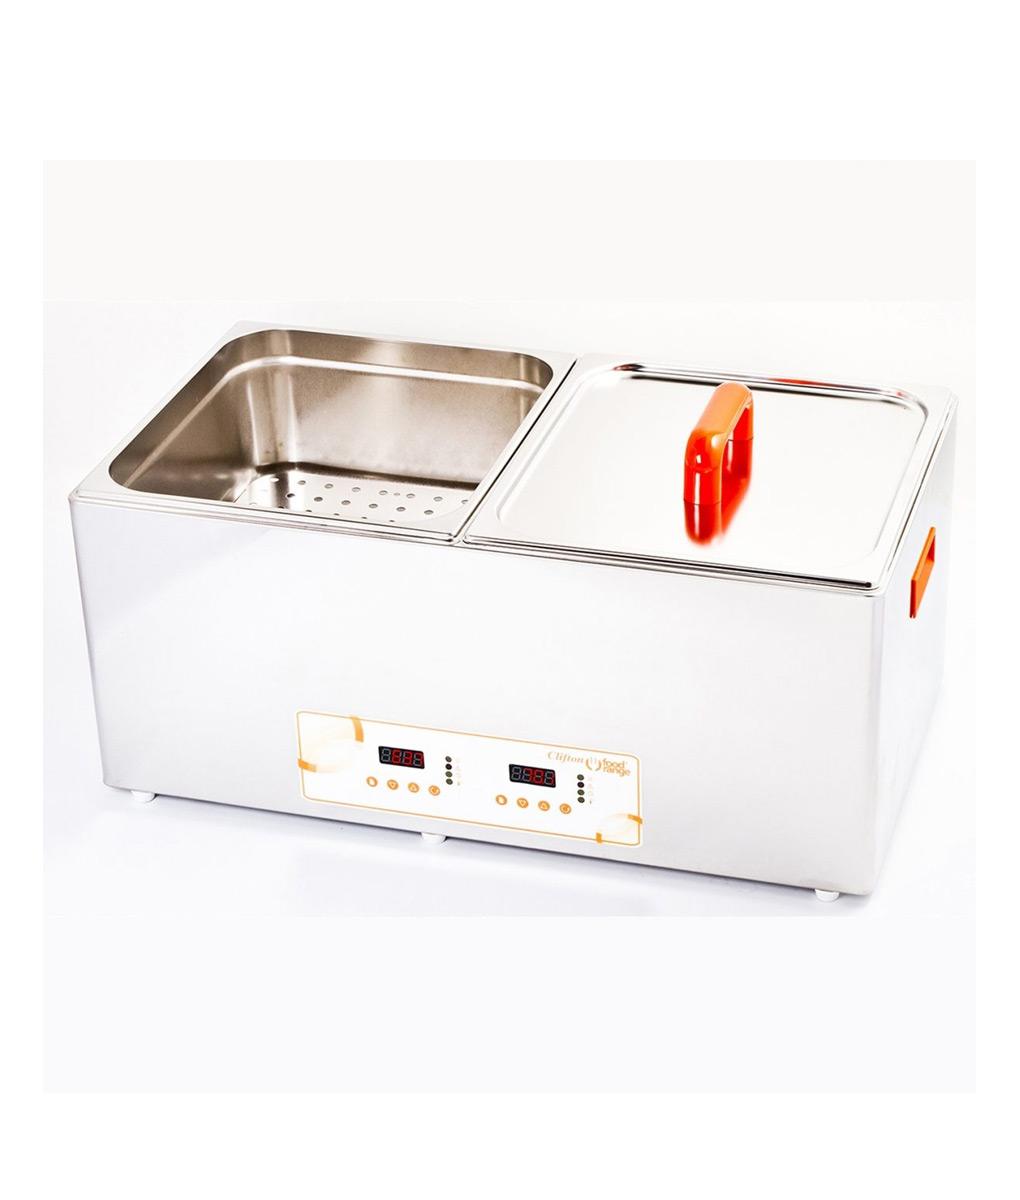 Unstirred Digital Bath 56 Litre by Clifton – end control bi-fold lid version Electrical 2